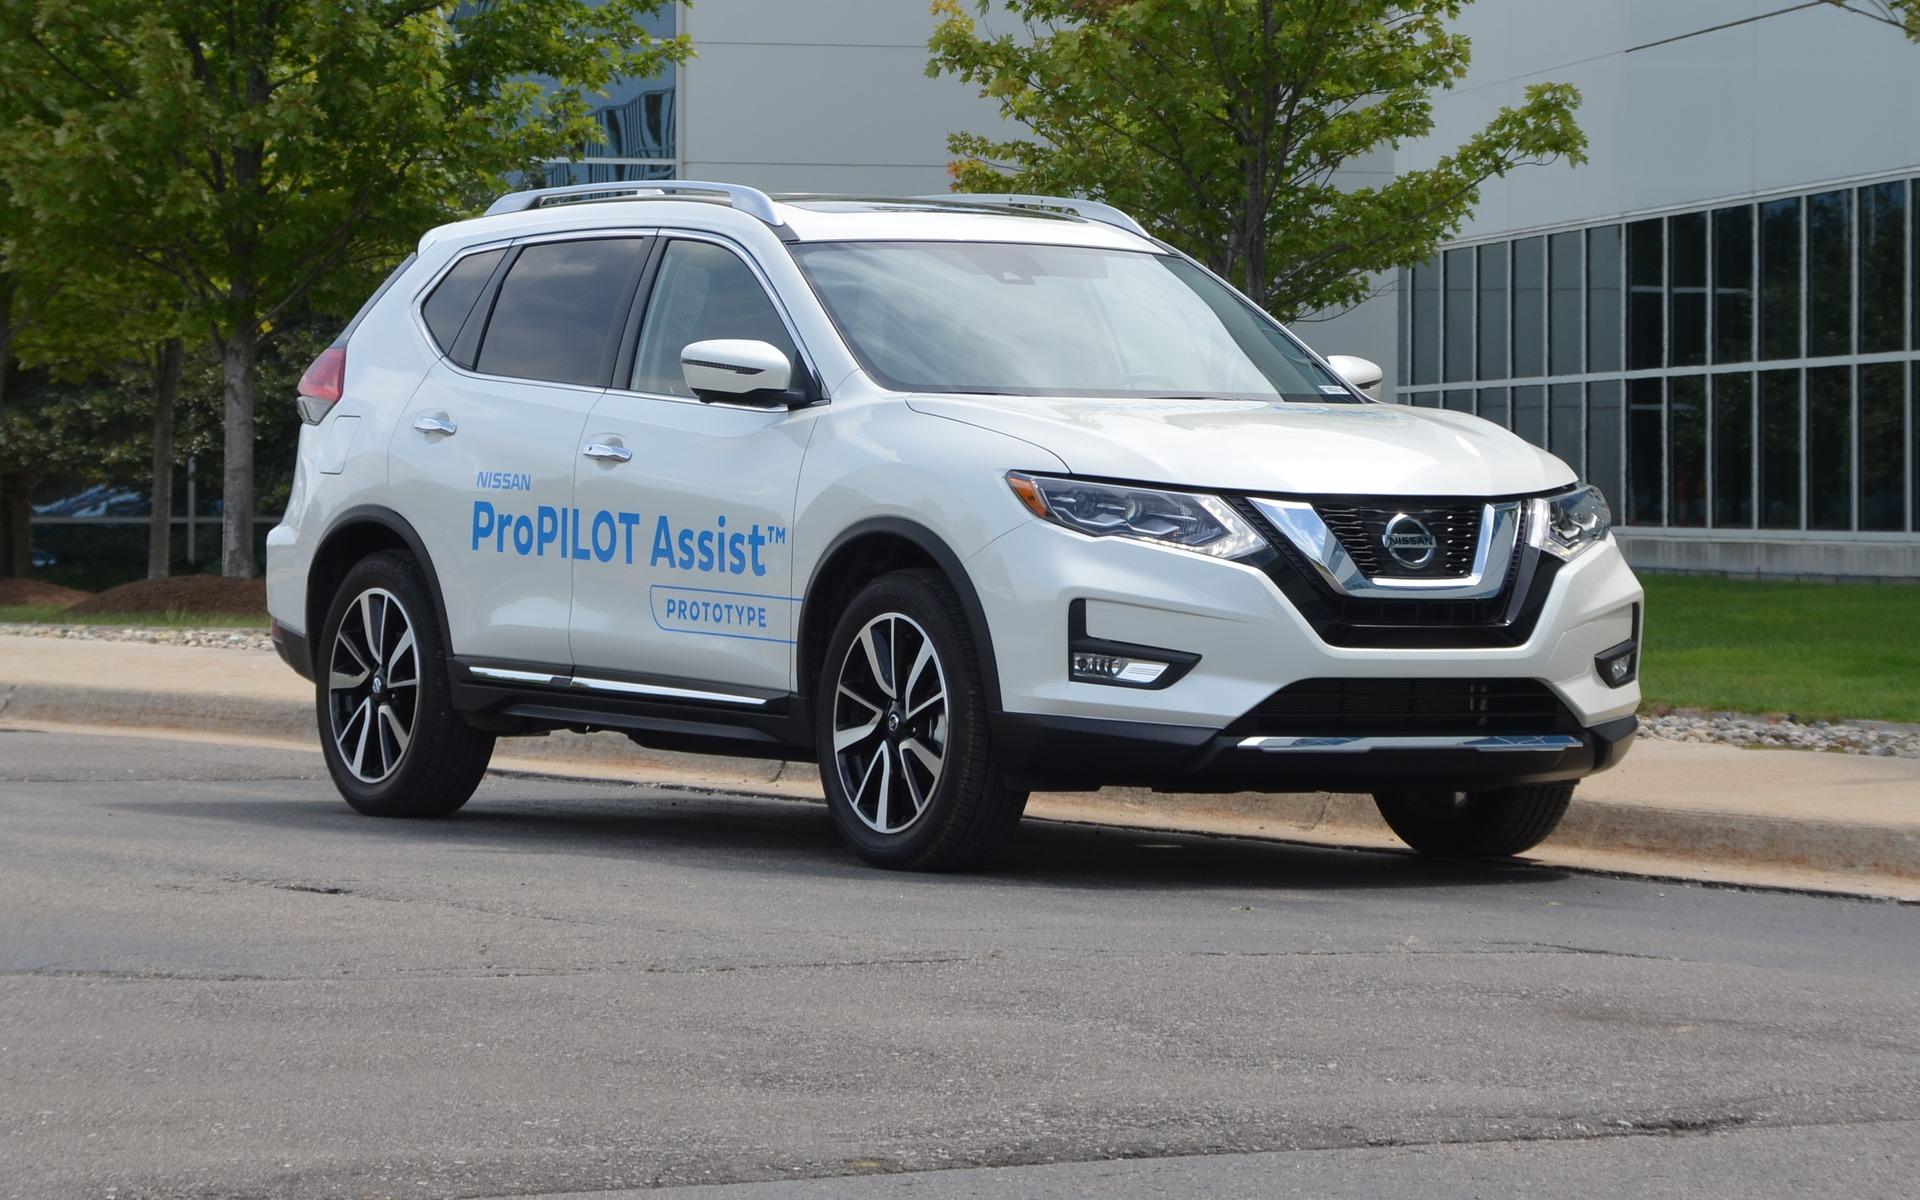 Nissan ProPILOT Assist Following The Semi Autonomous Parade From A Distance